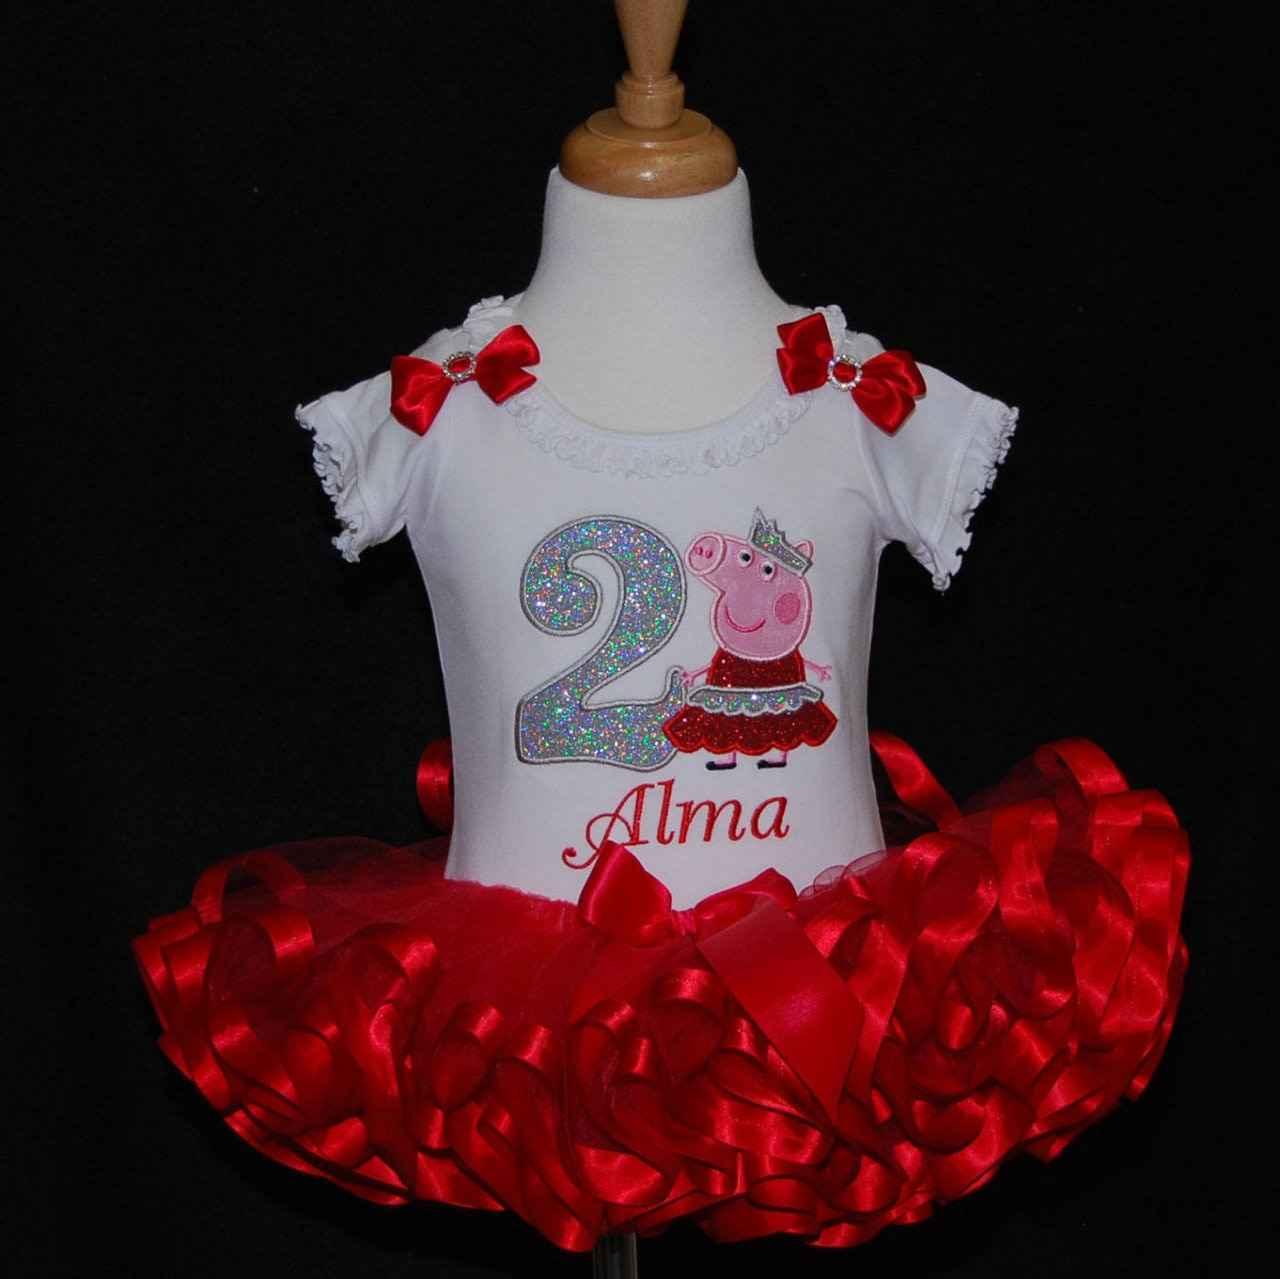 peppa pig birthday outfit 2nd Birthday Tutu Princess Peppa Pig Birthday Outfit toddler tutu birthday dress glitter number birthday shirt